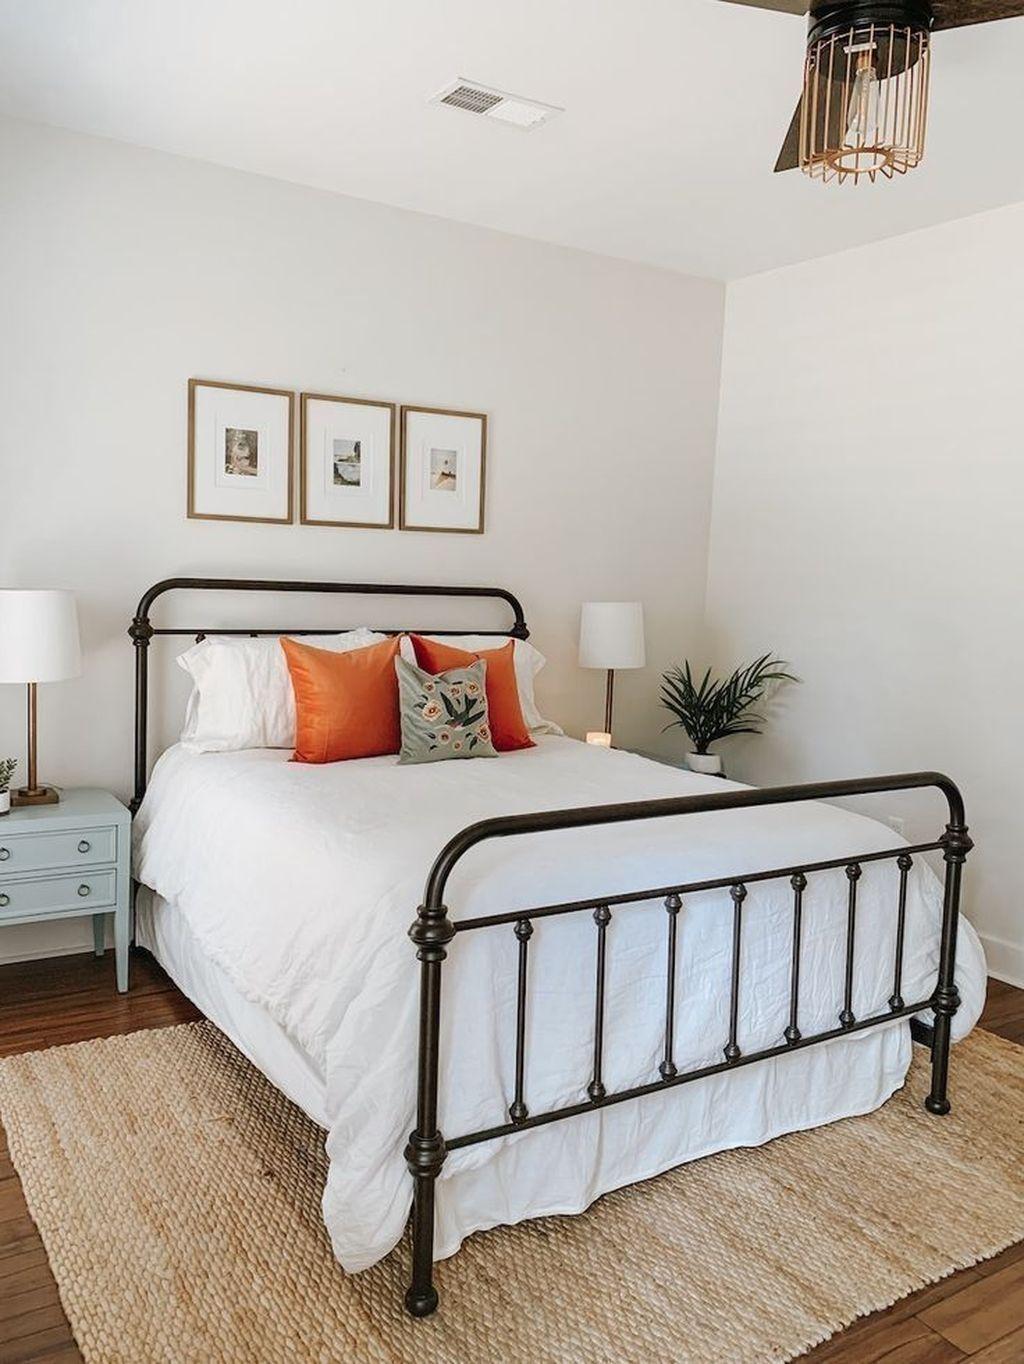 30 Top Minimalist Bedroom Interior Design Ideas For Your Inspiration Minimalist Bedroom Bedroom Design White Comforter